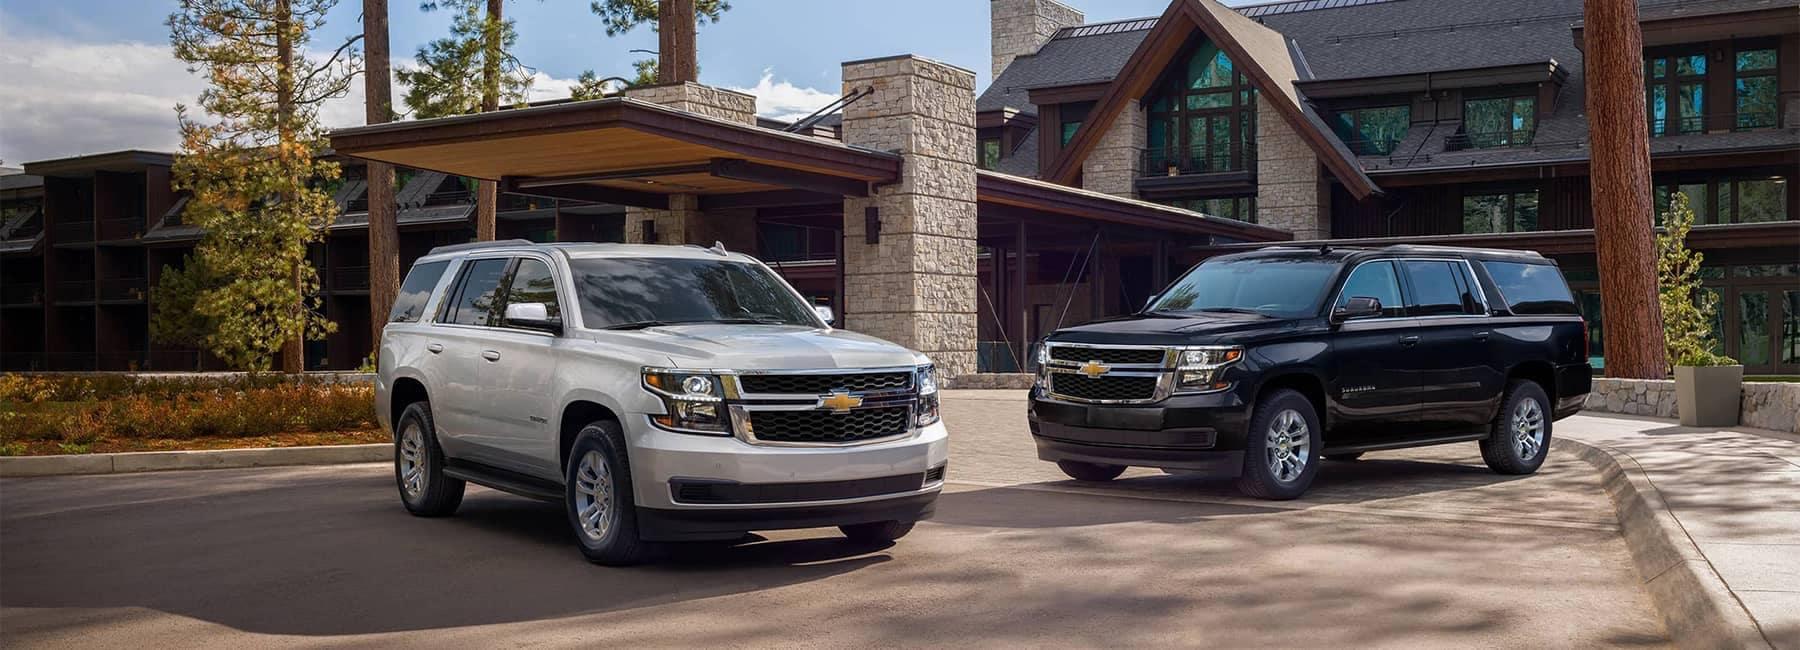 2020 Chevrolet SUVs Suburban and Tahoe